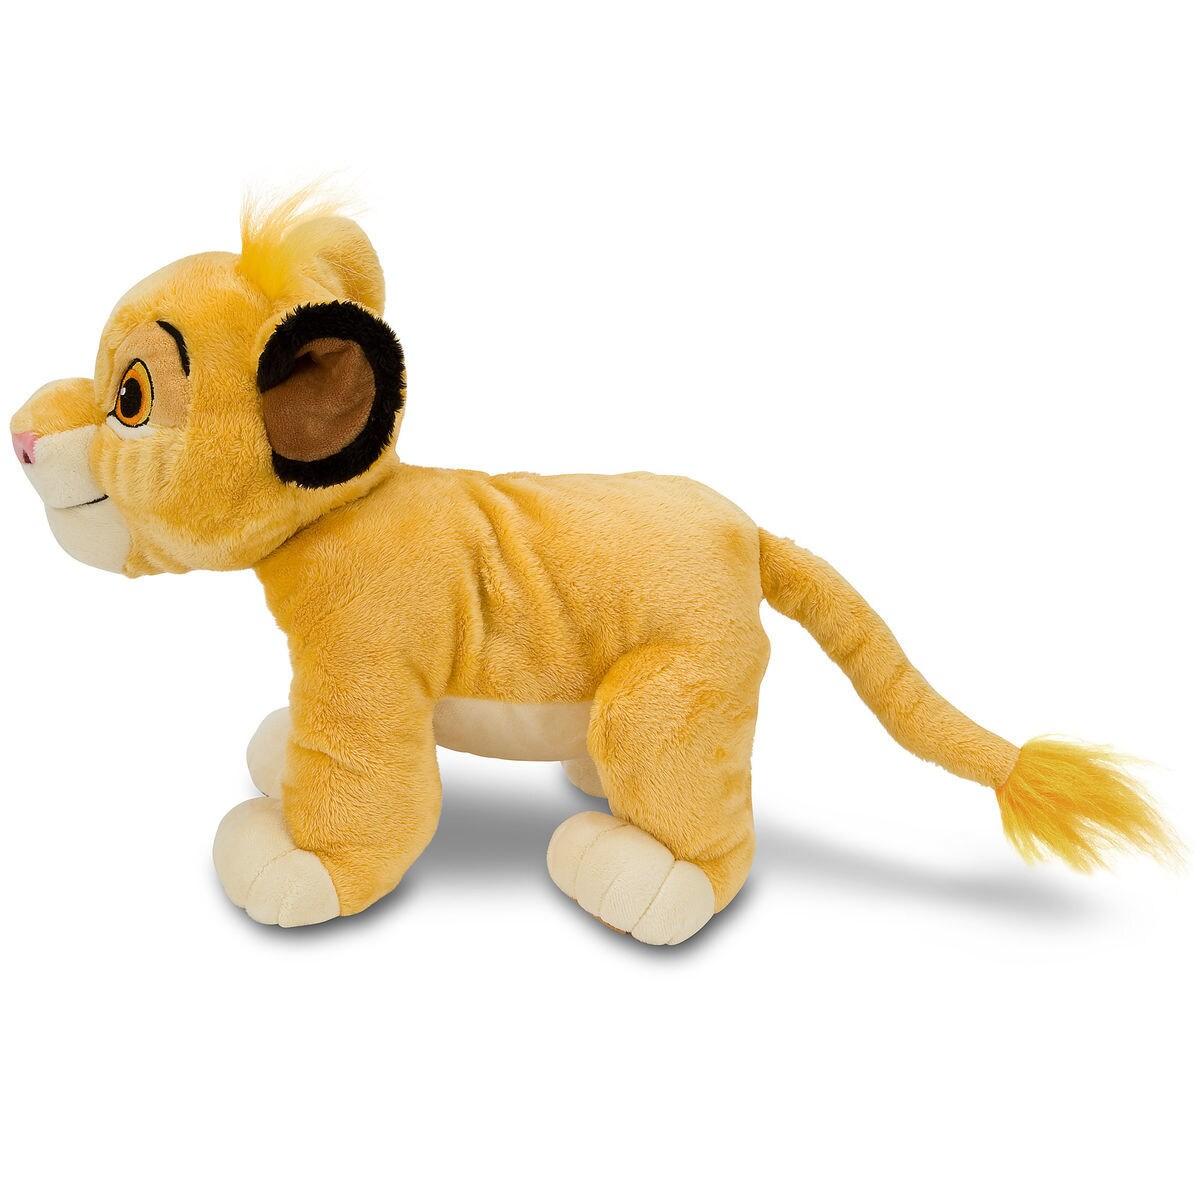 Simba Plush The Lion King Medium 11 Shopdisney